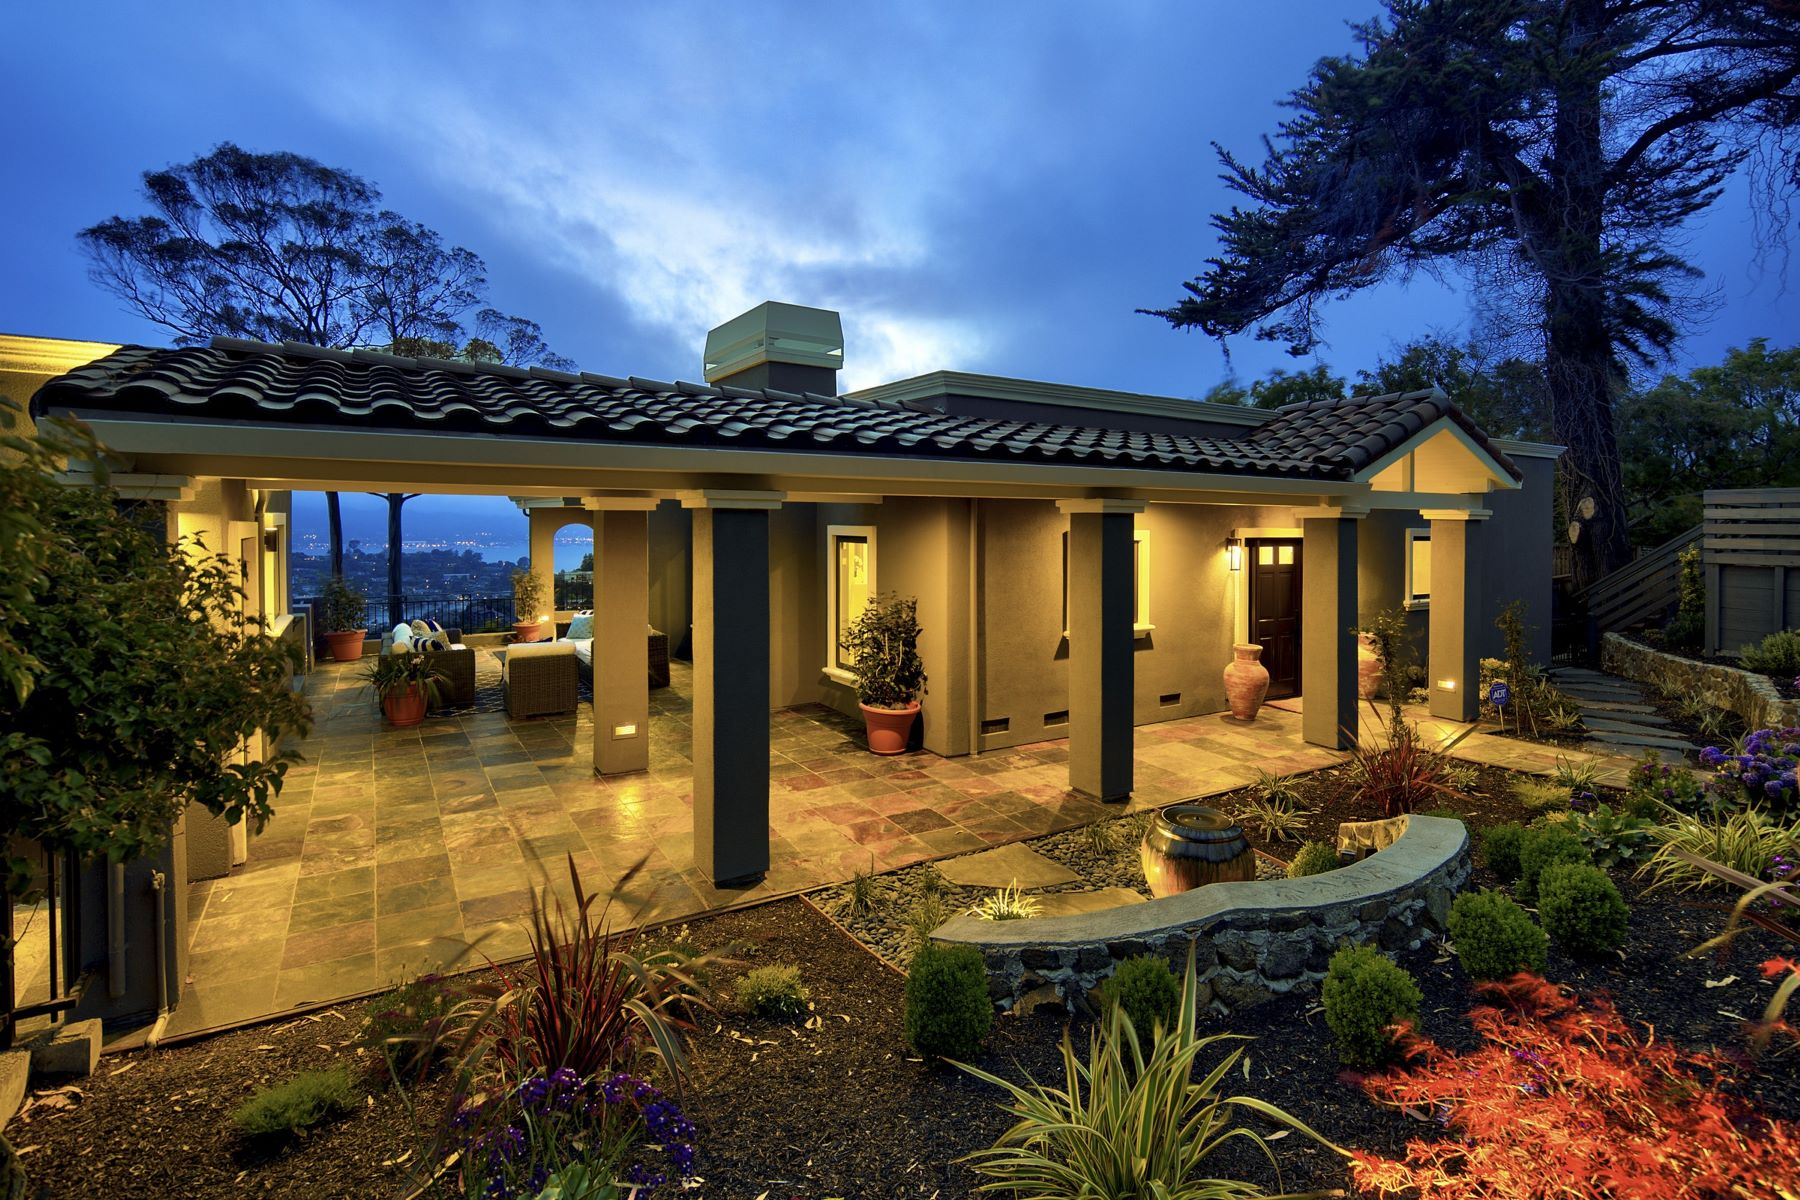 Casa Unifamiliar por un Venta en Unsurpassed Stunning Renovation! 1830 Mountain View Dr Tiburon, California, 94920 Estados Unidos